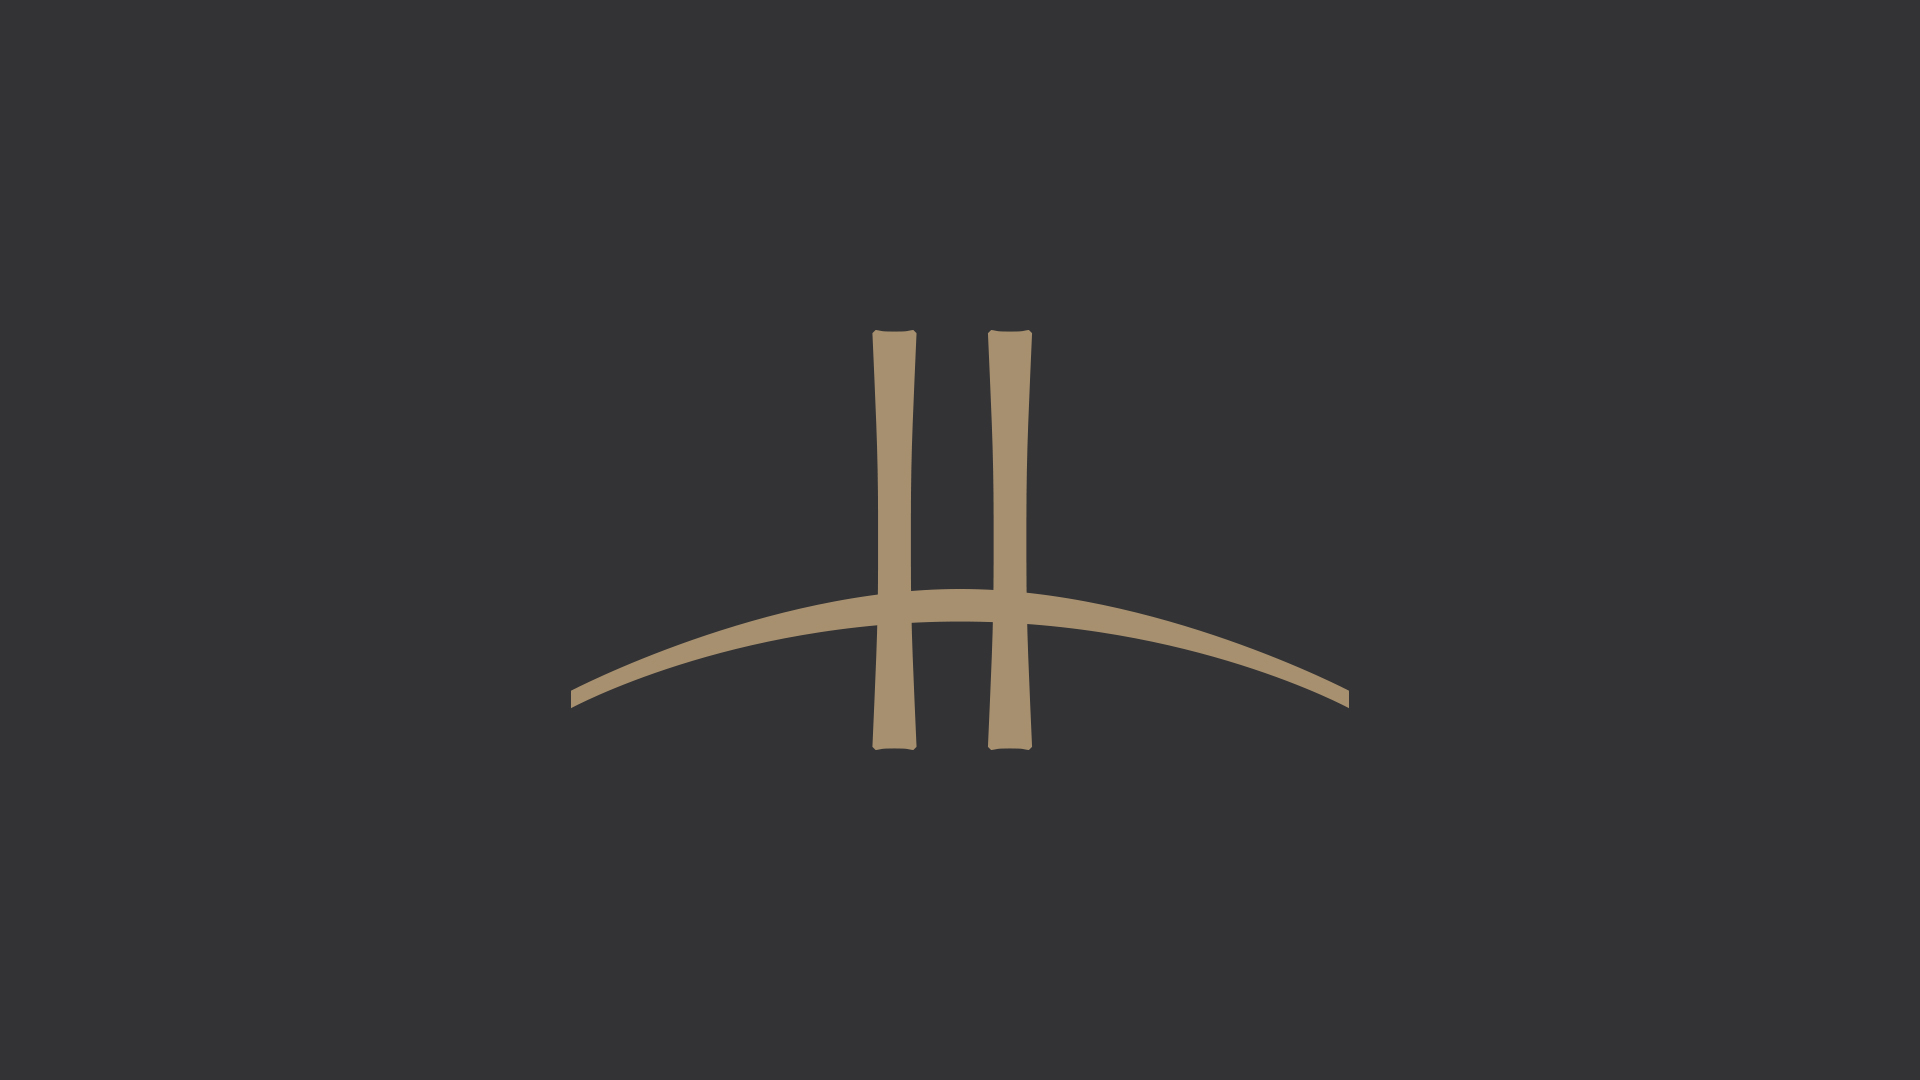 hill_logo